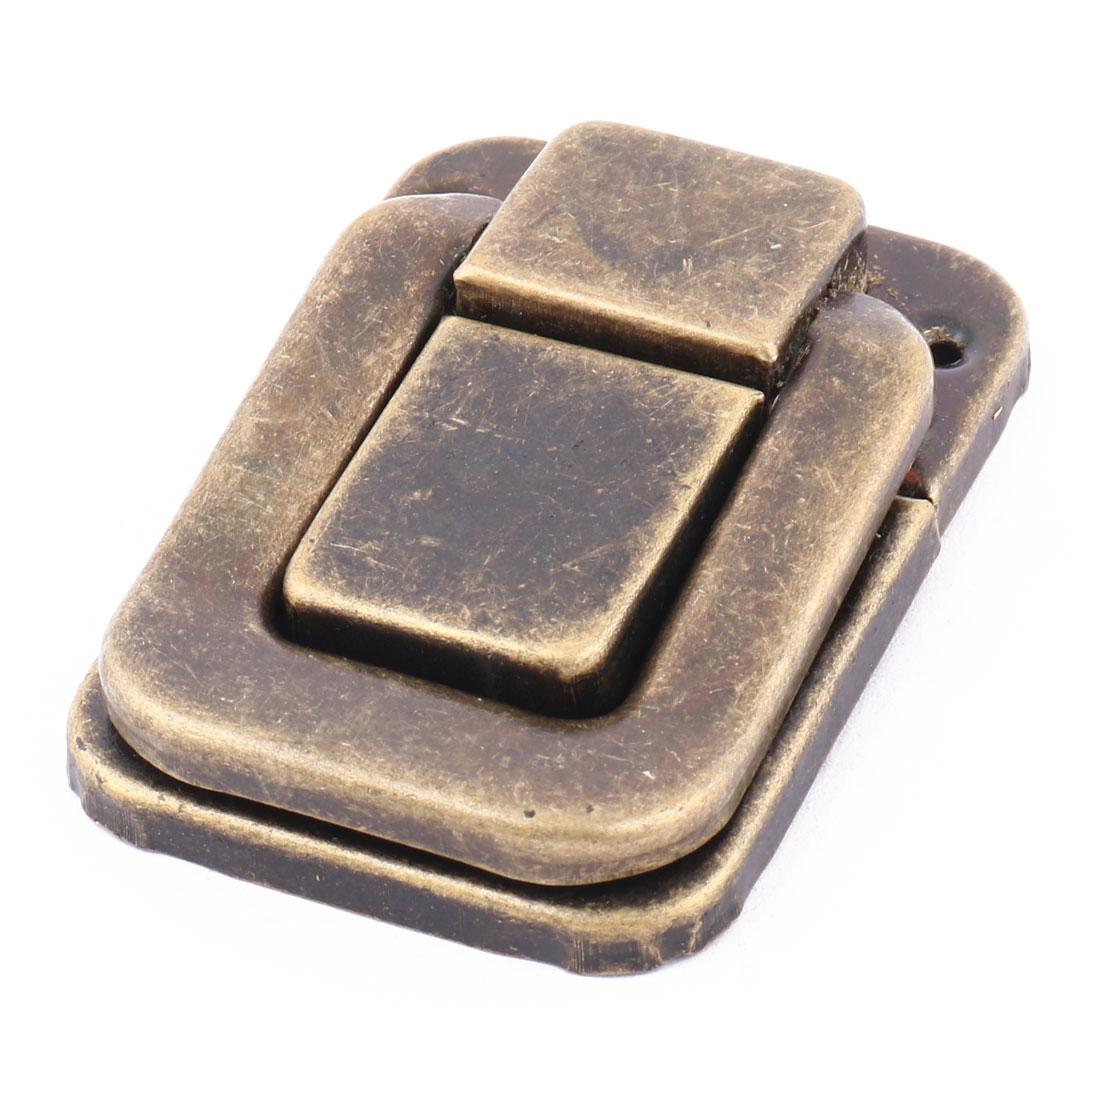 Chest Box Lock Hook Hinge Latch Hasp w Screws Brass Tone 80mm x 55mm Set